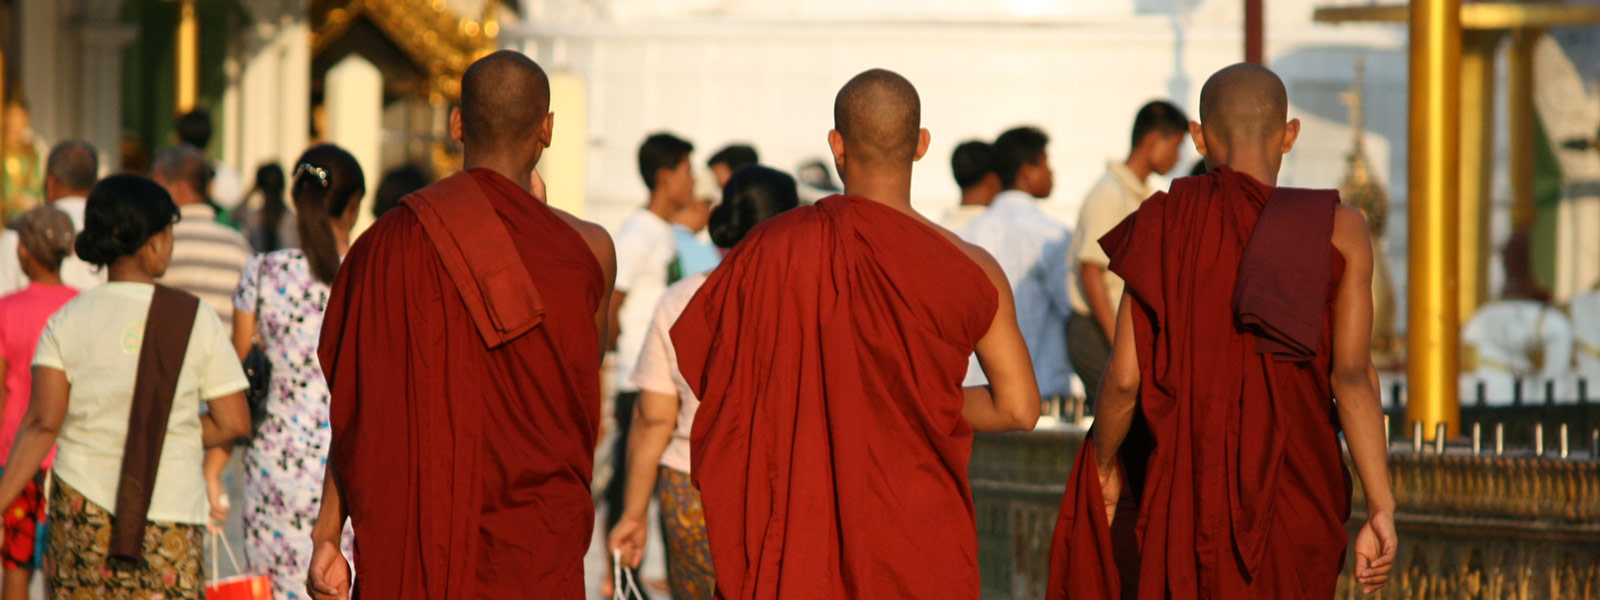 burma - myanmar country trip